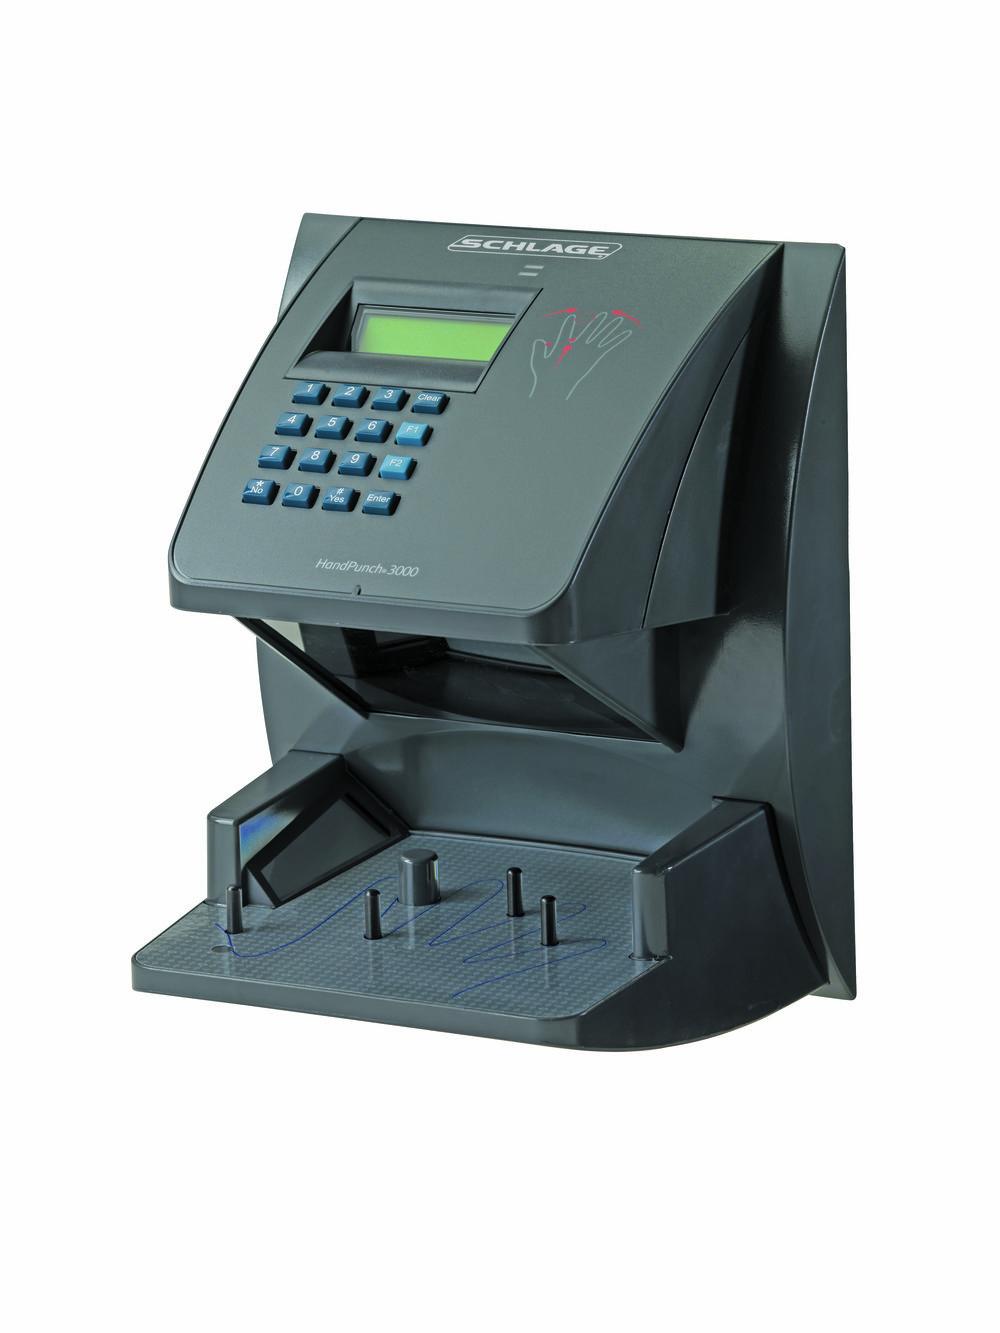 Burglar System, Access Control Systems